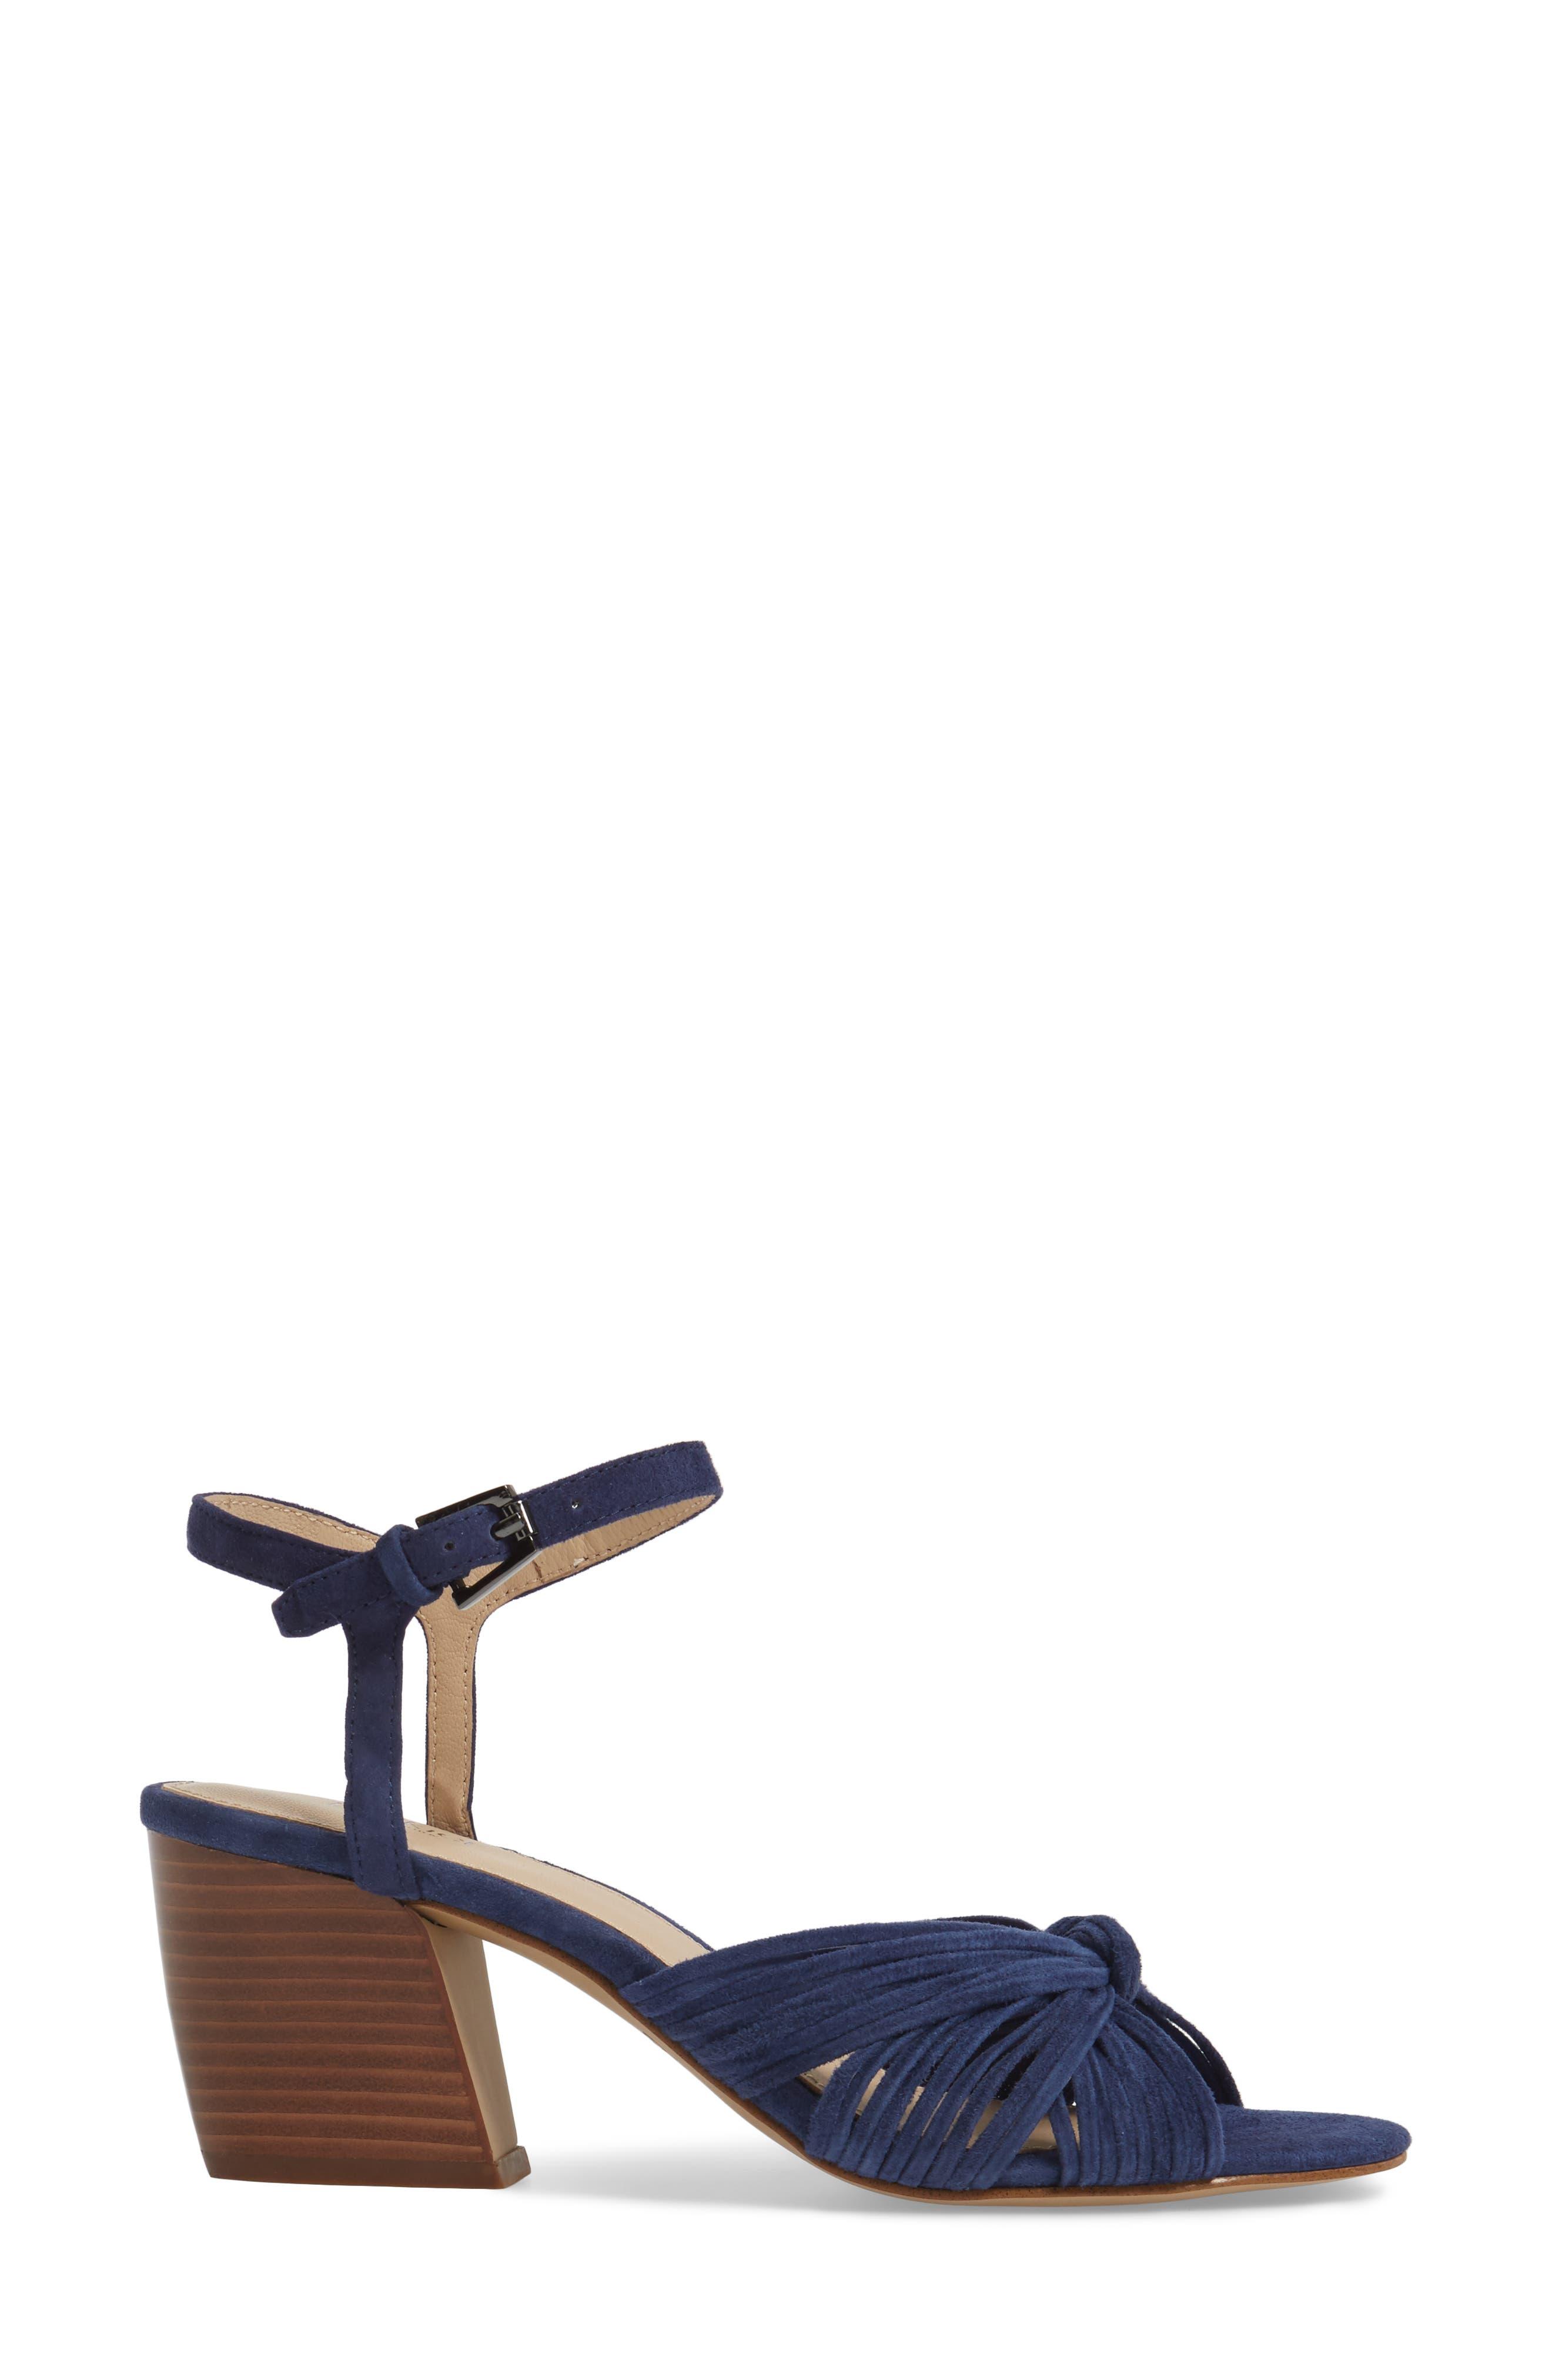 Patsy Block Heel Sandal,                             Alternate thumbnail 3, color,                             Navy